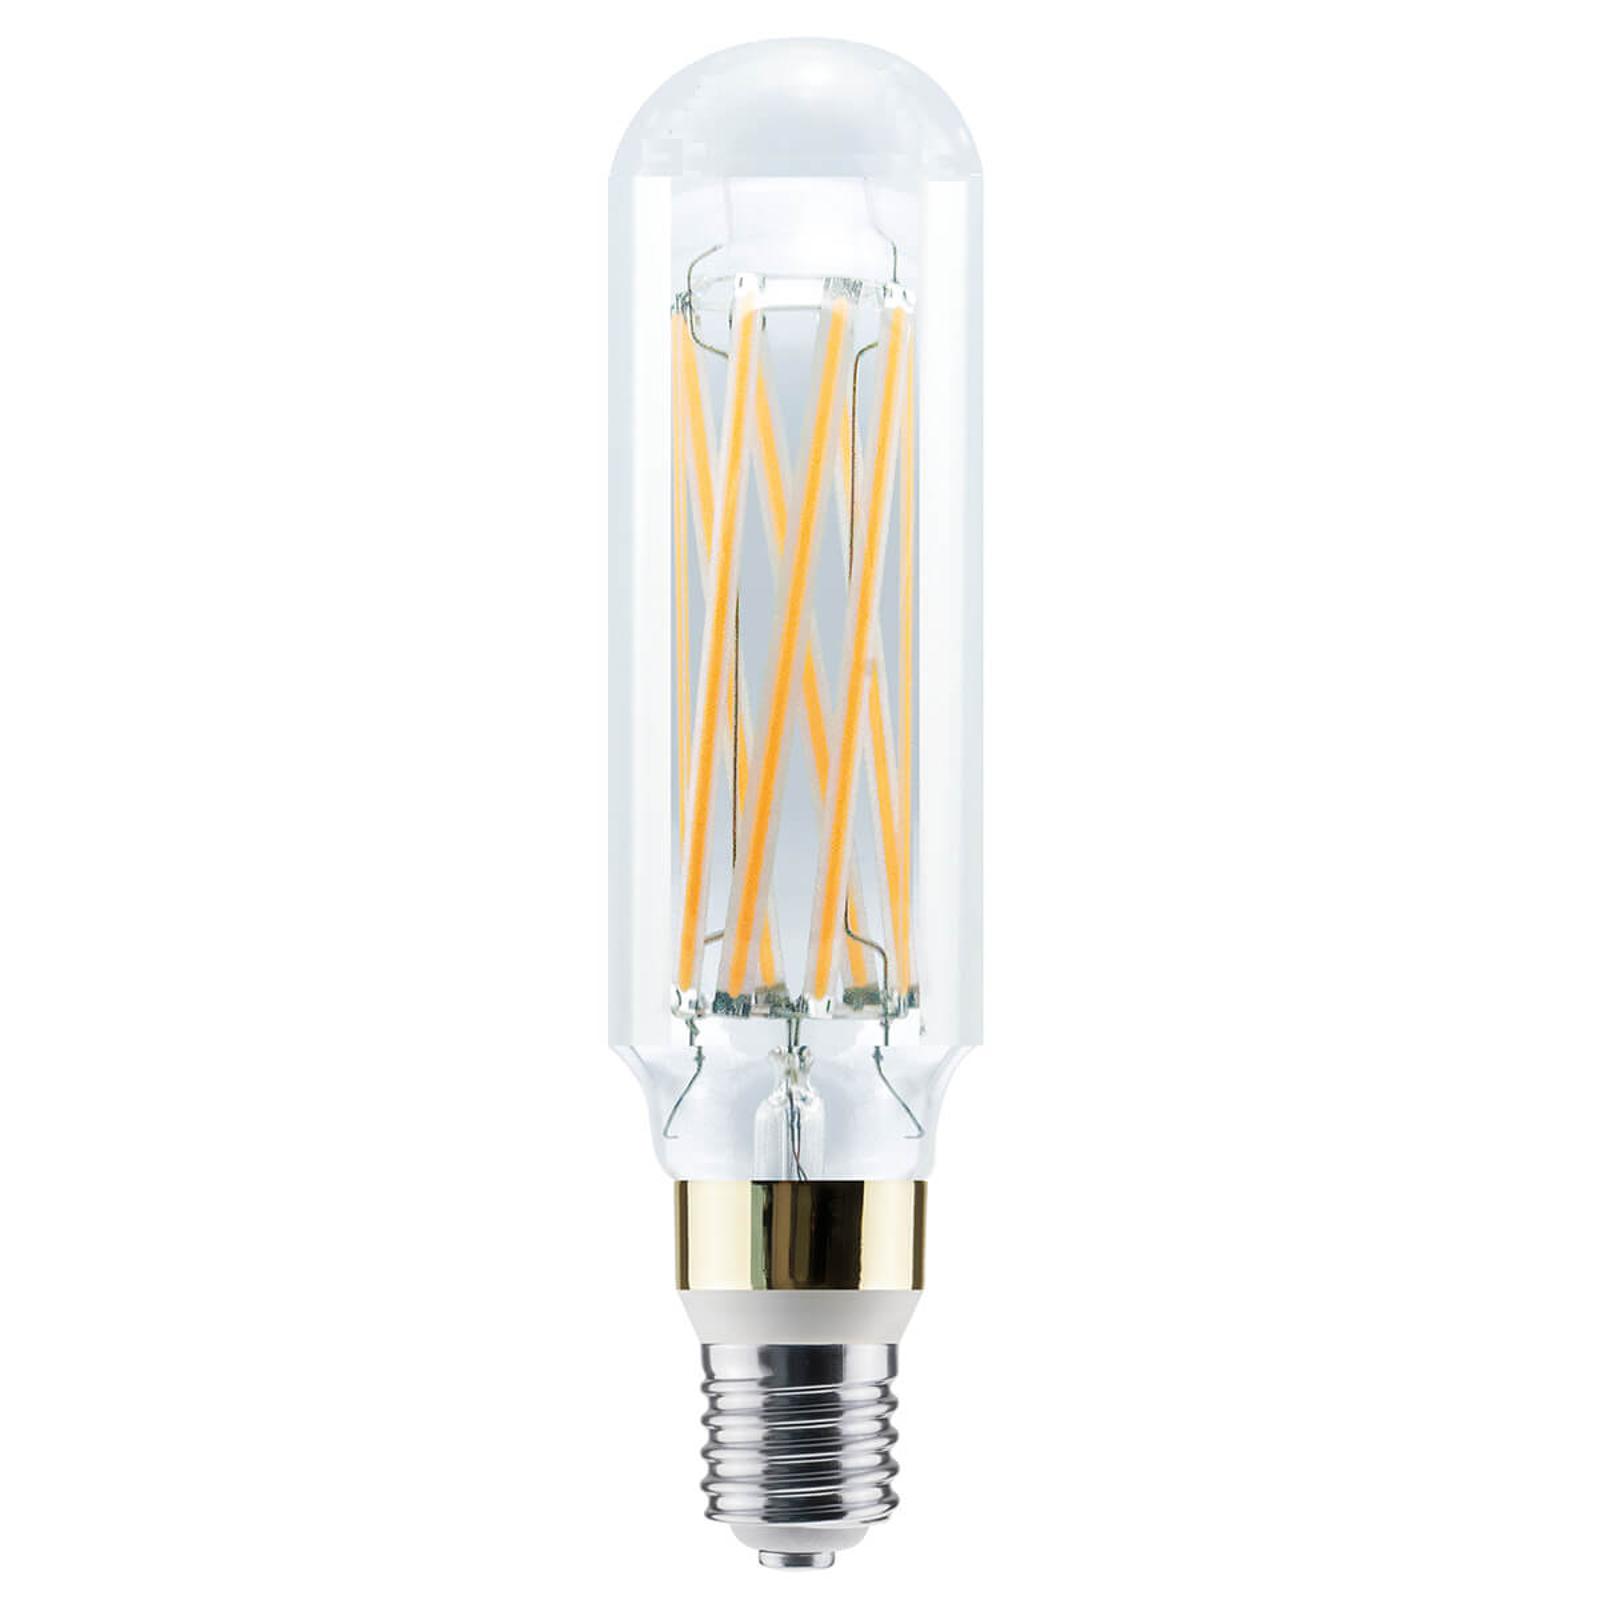 Tubo LED E40 40W, bianco neutro, 4.250 lumen